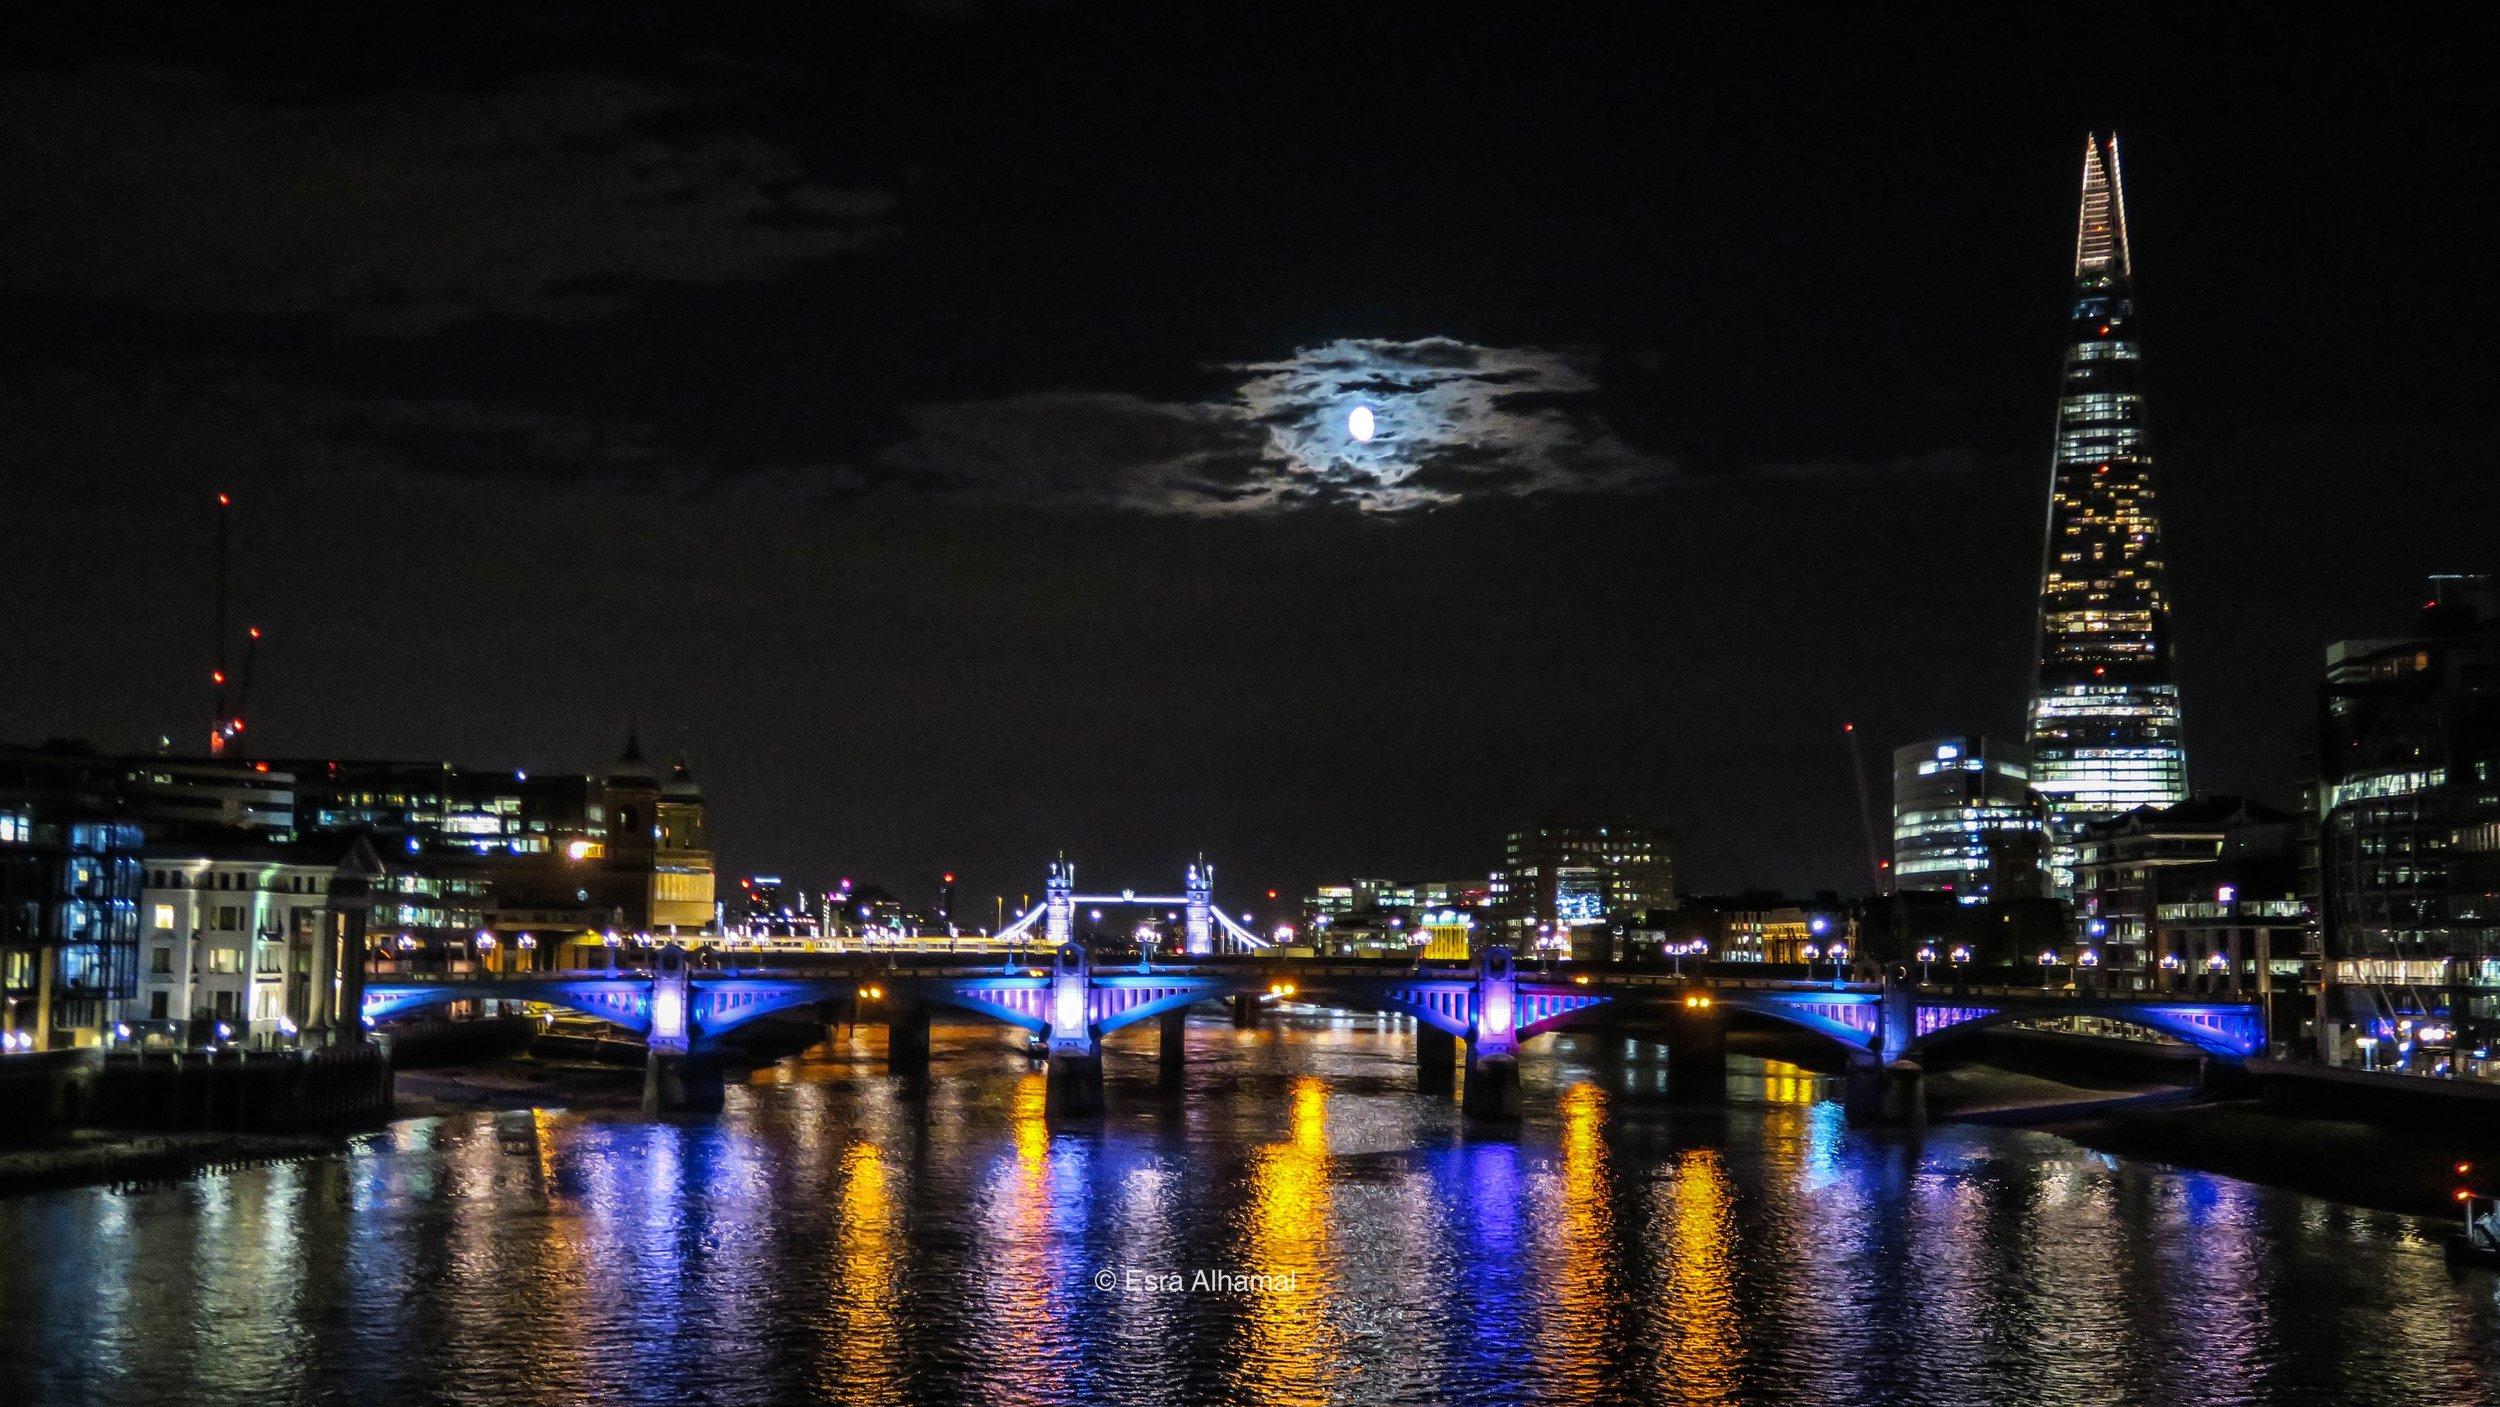 London Night Photography Using Canon G7X